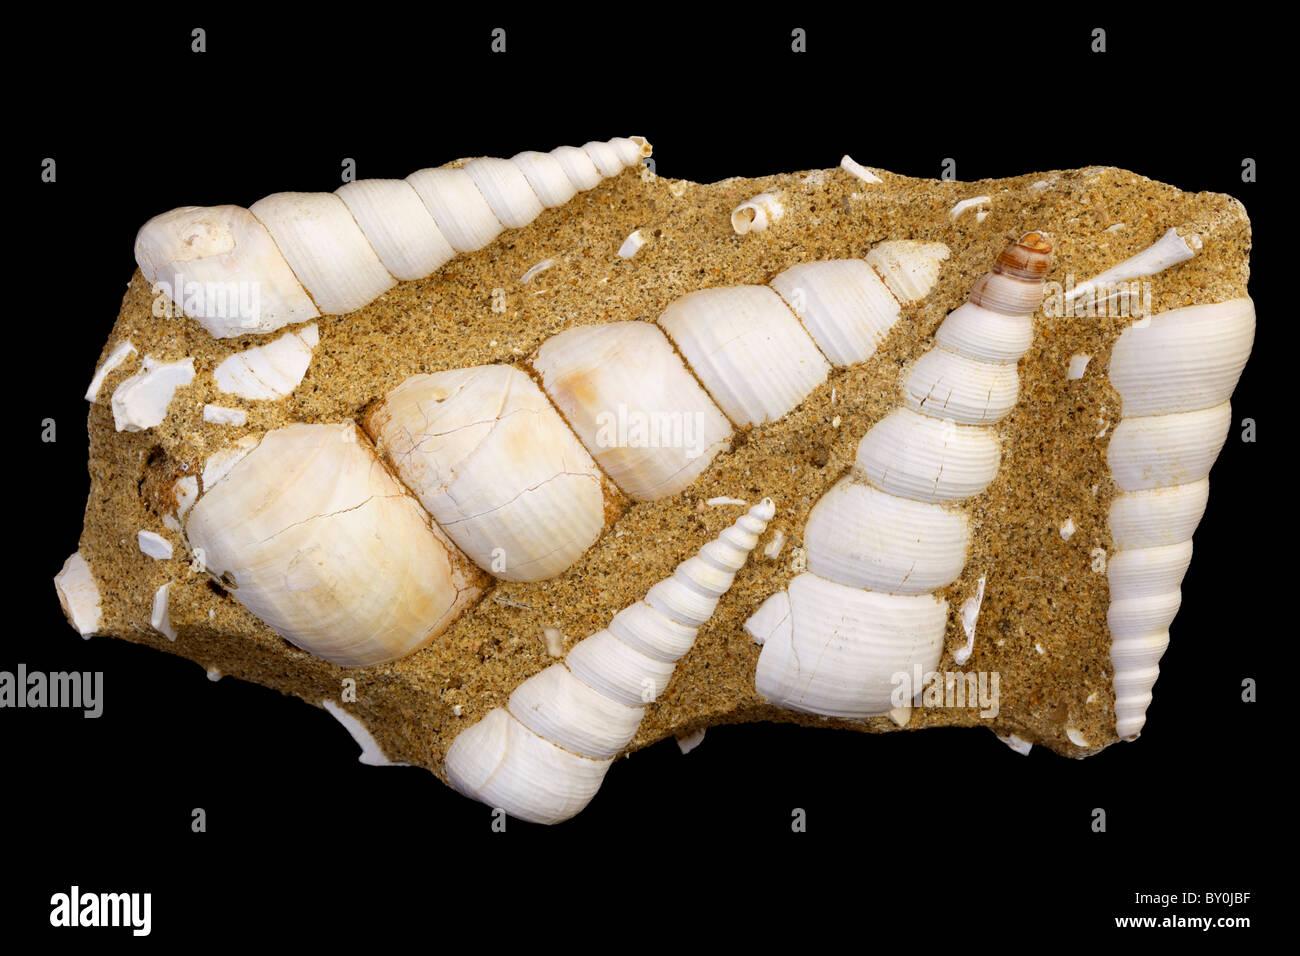 Fossil Sea snail (marine gastropod) - Turritella terebra - Miocene - Bordeaux - France - Stock Image